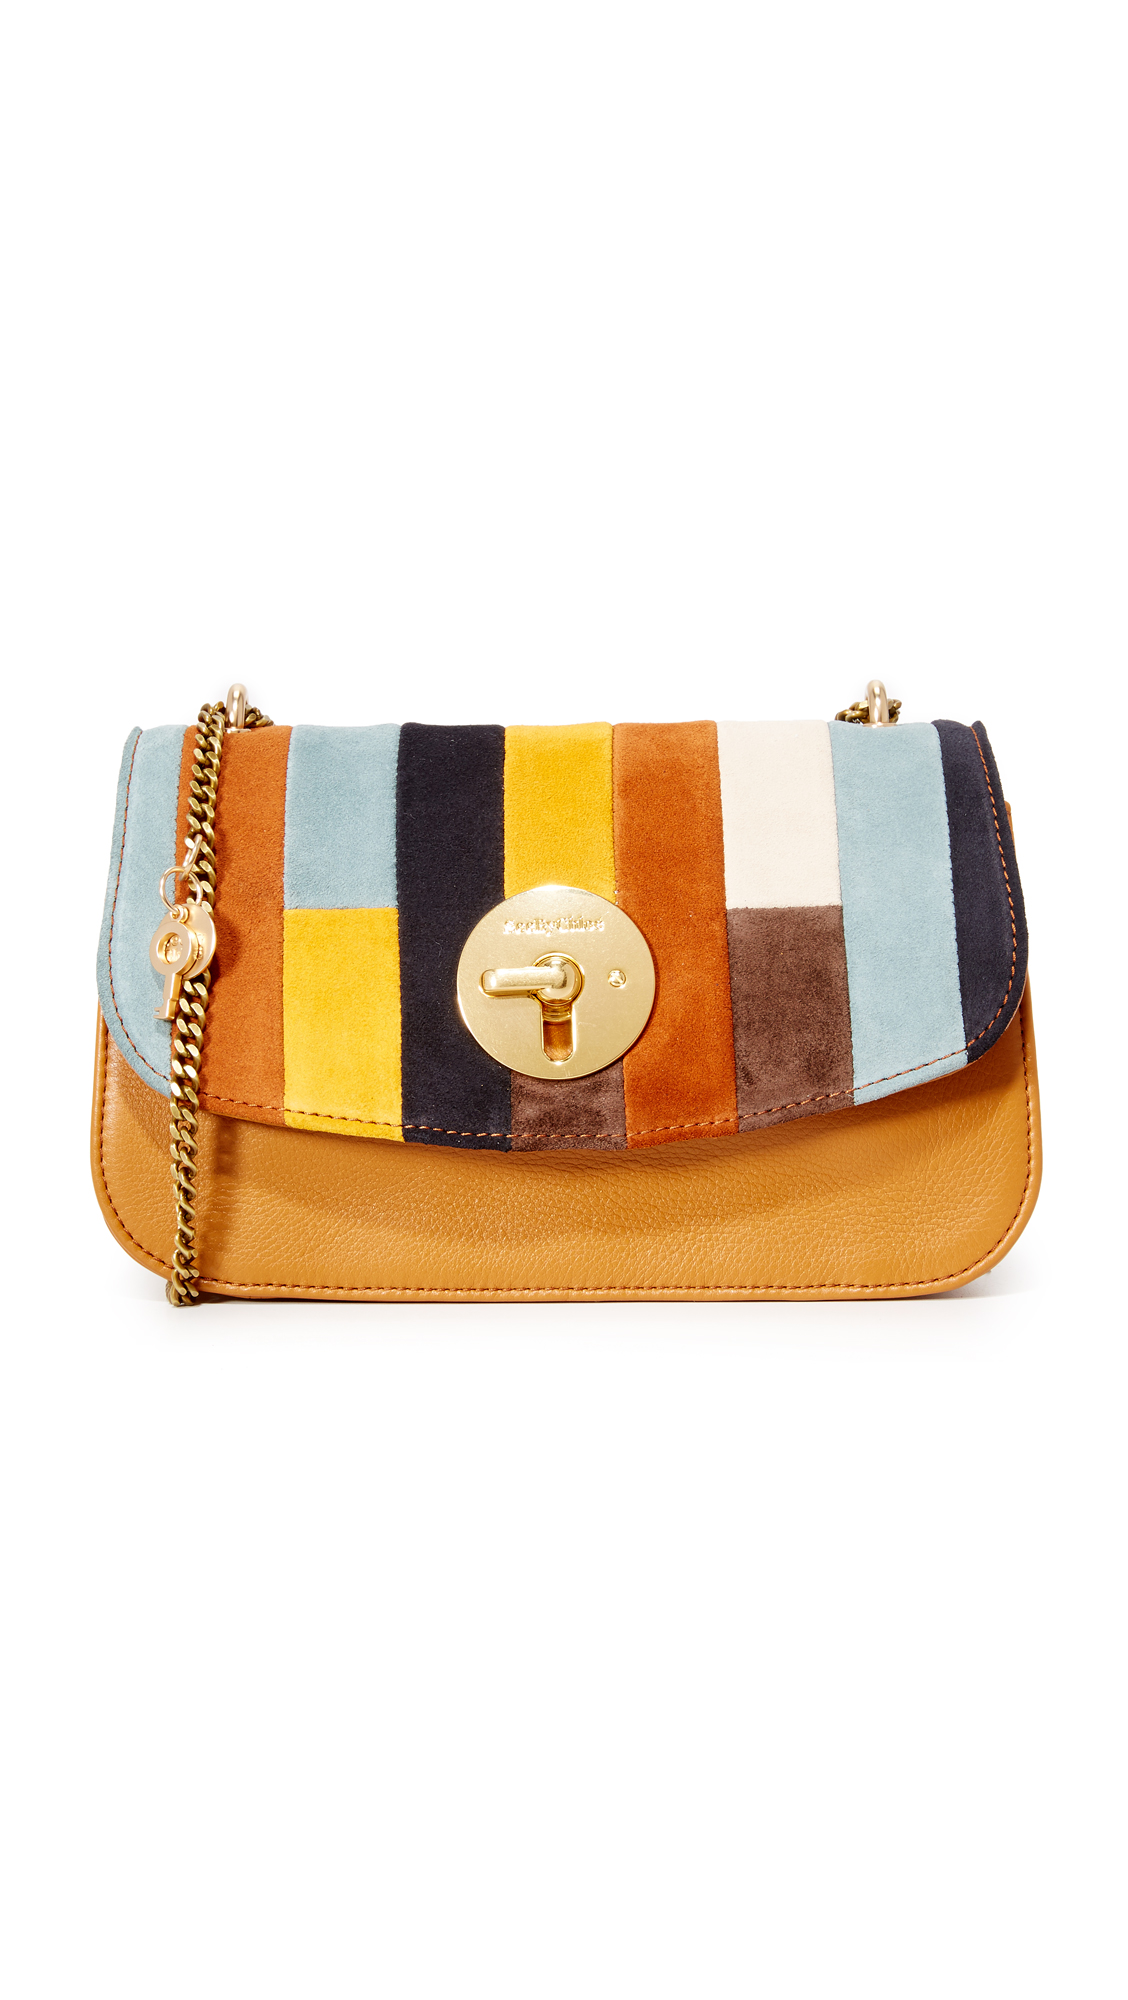 0f81291d See By Chloe Lois Suede Shoulder Bag